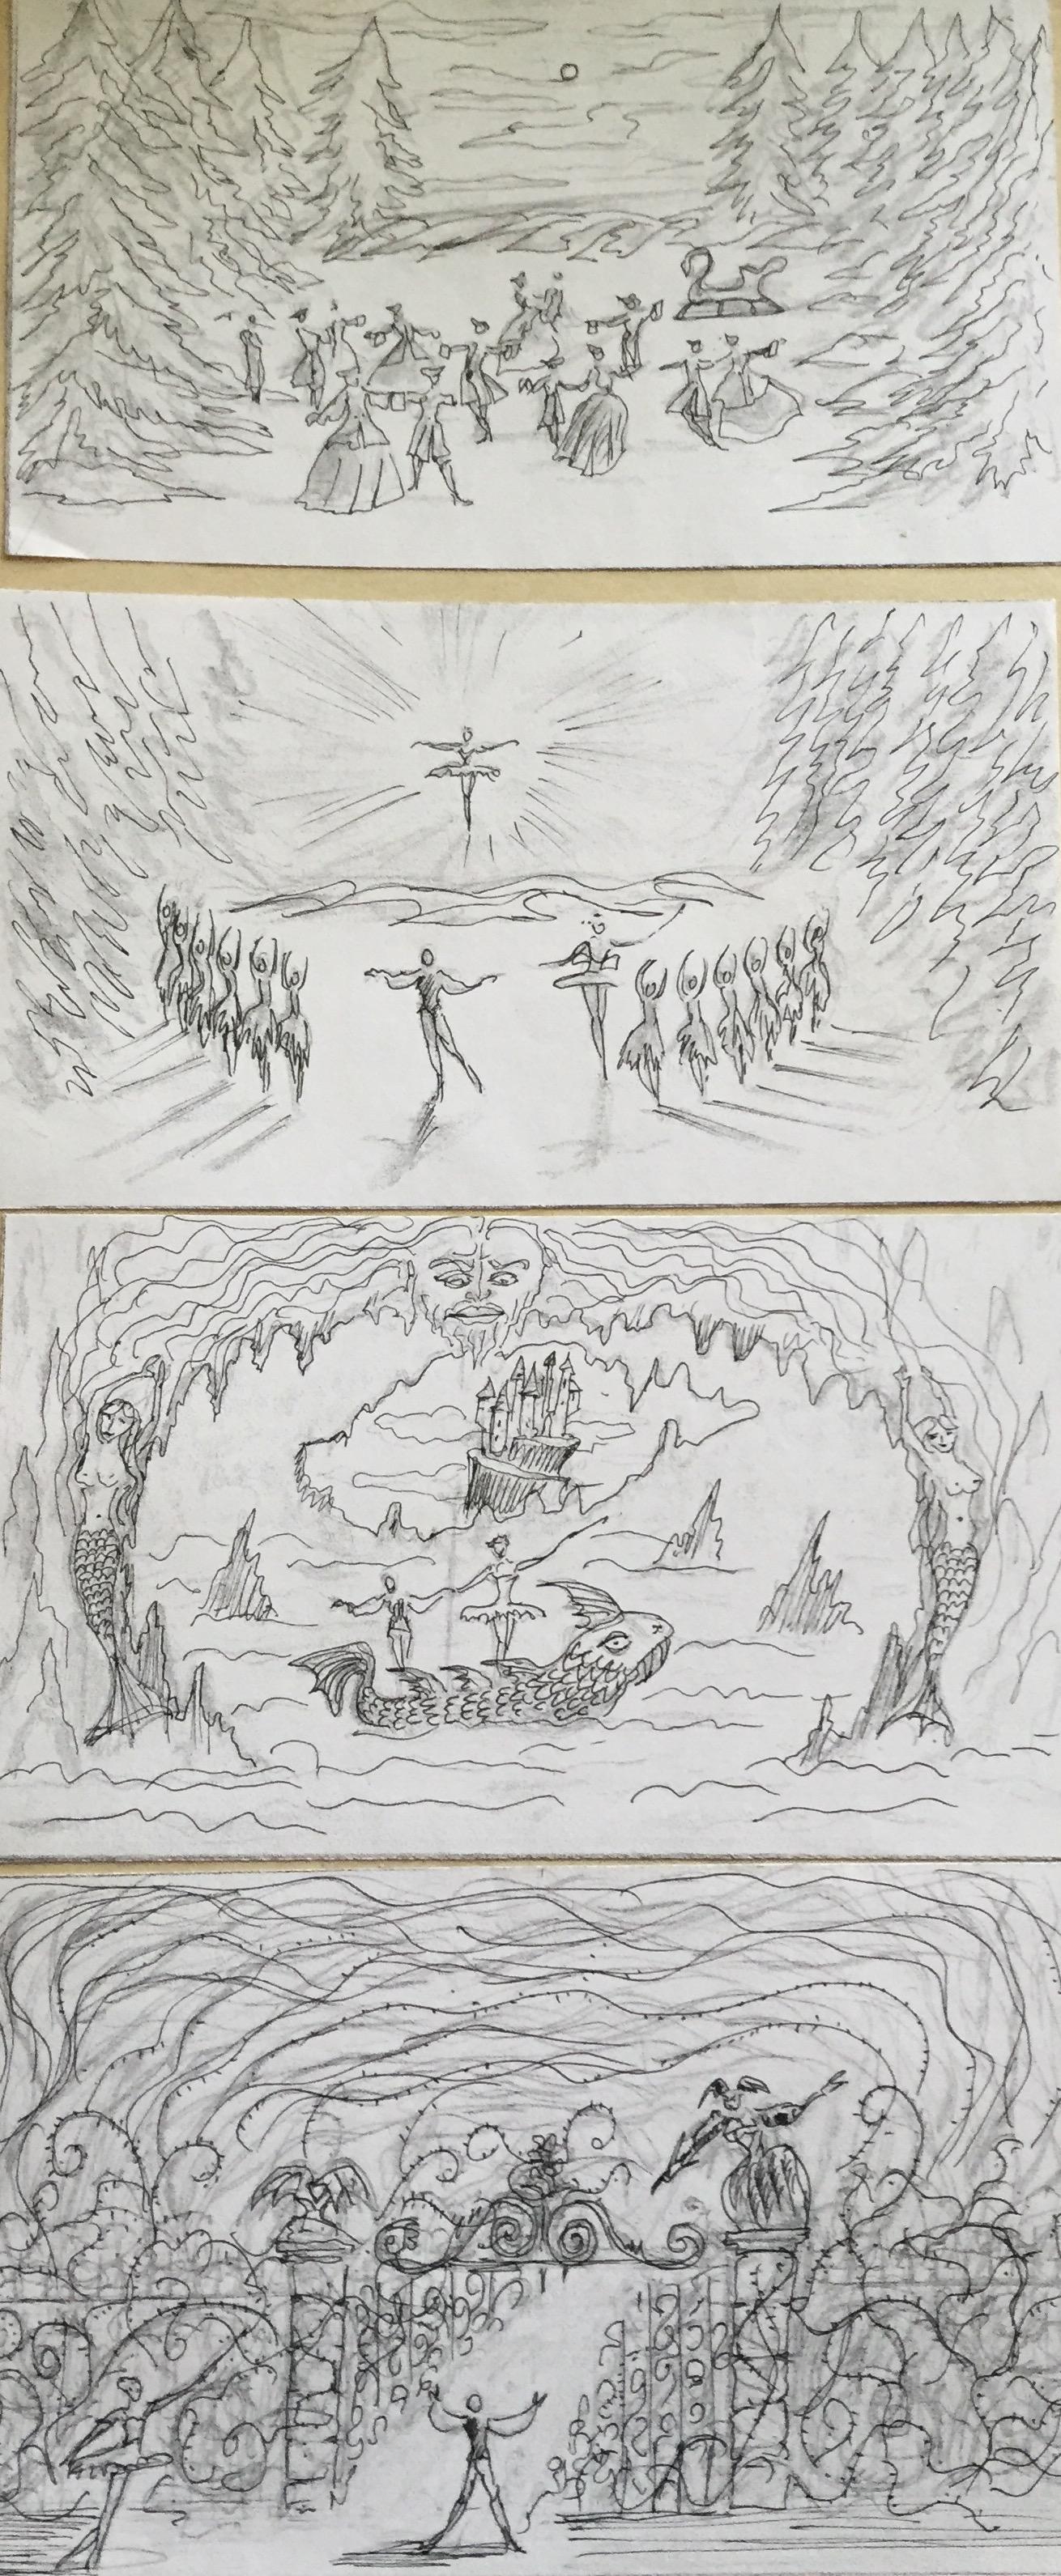 Sleeping Beauty ballet - producction design - David Roger 9 .jpg